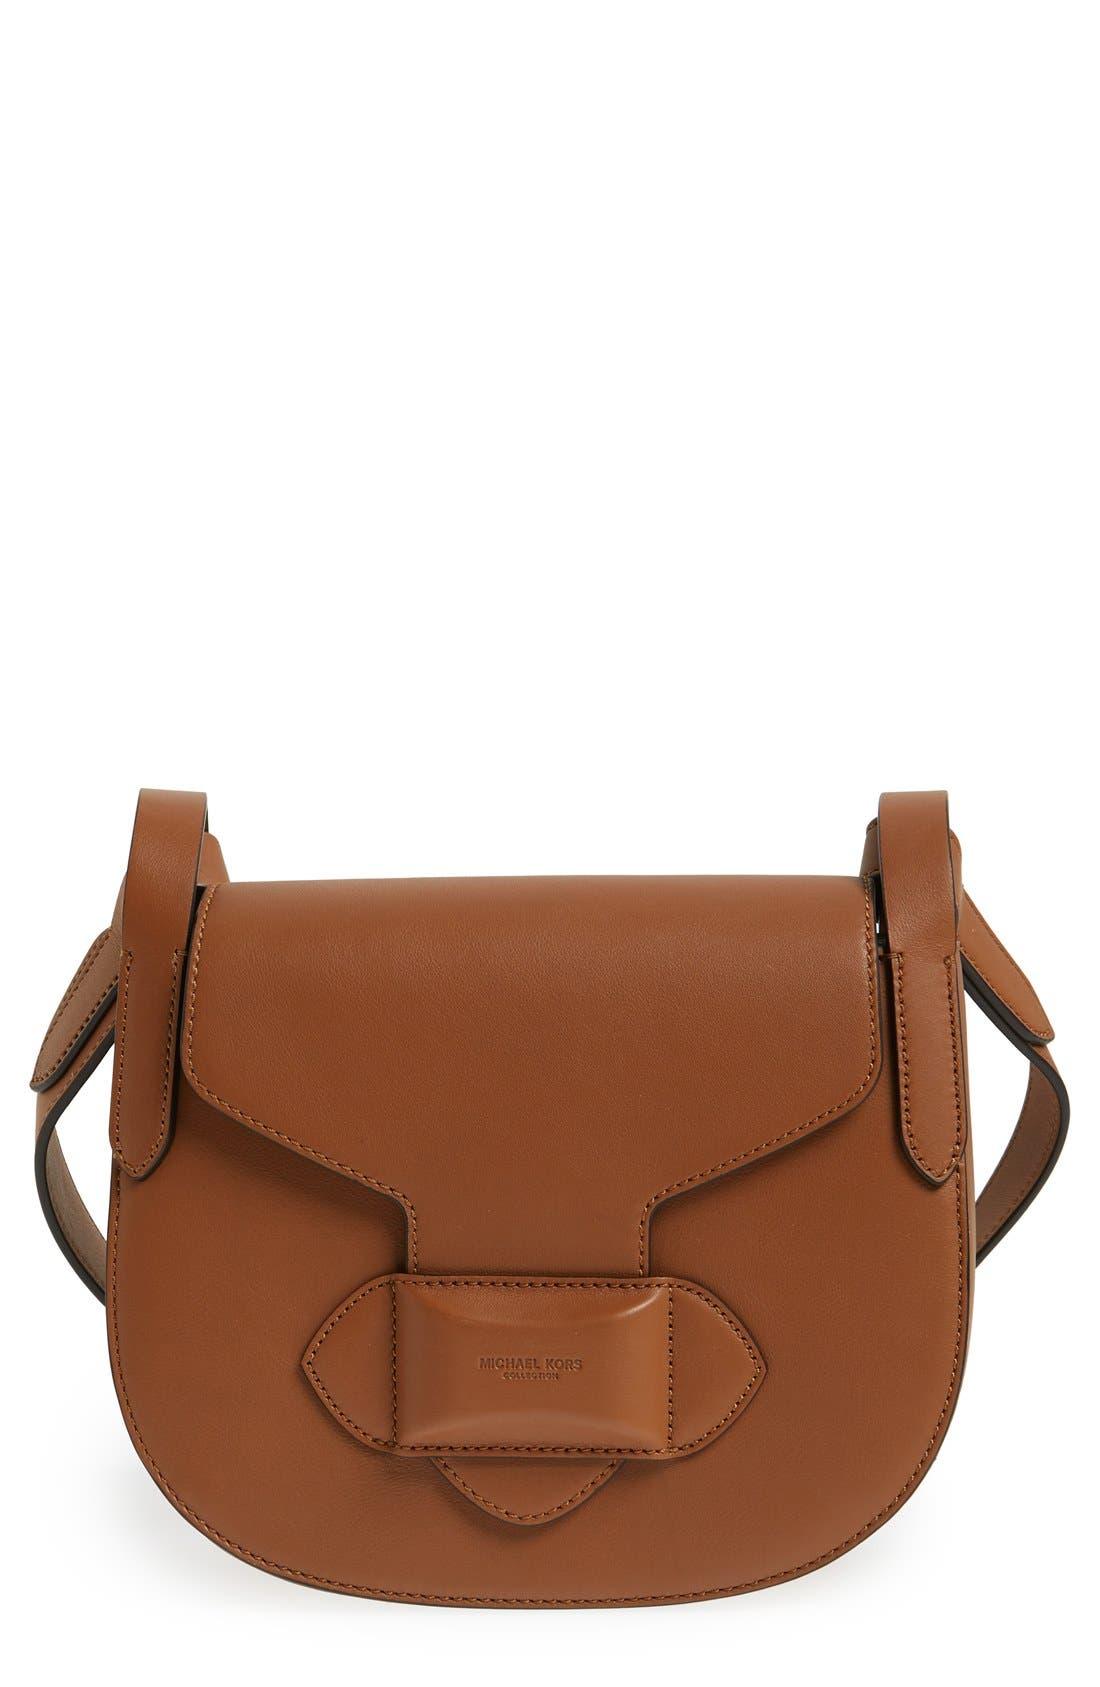 Michael Kors 'Small Daria' Leather Crossbody Bag